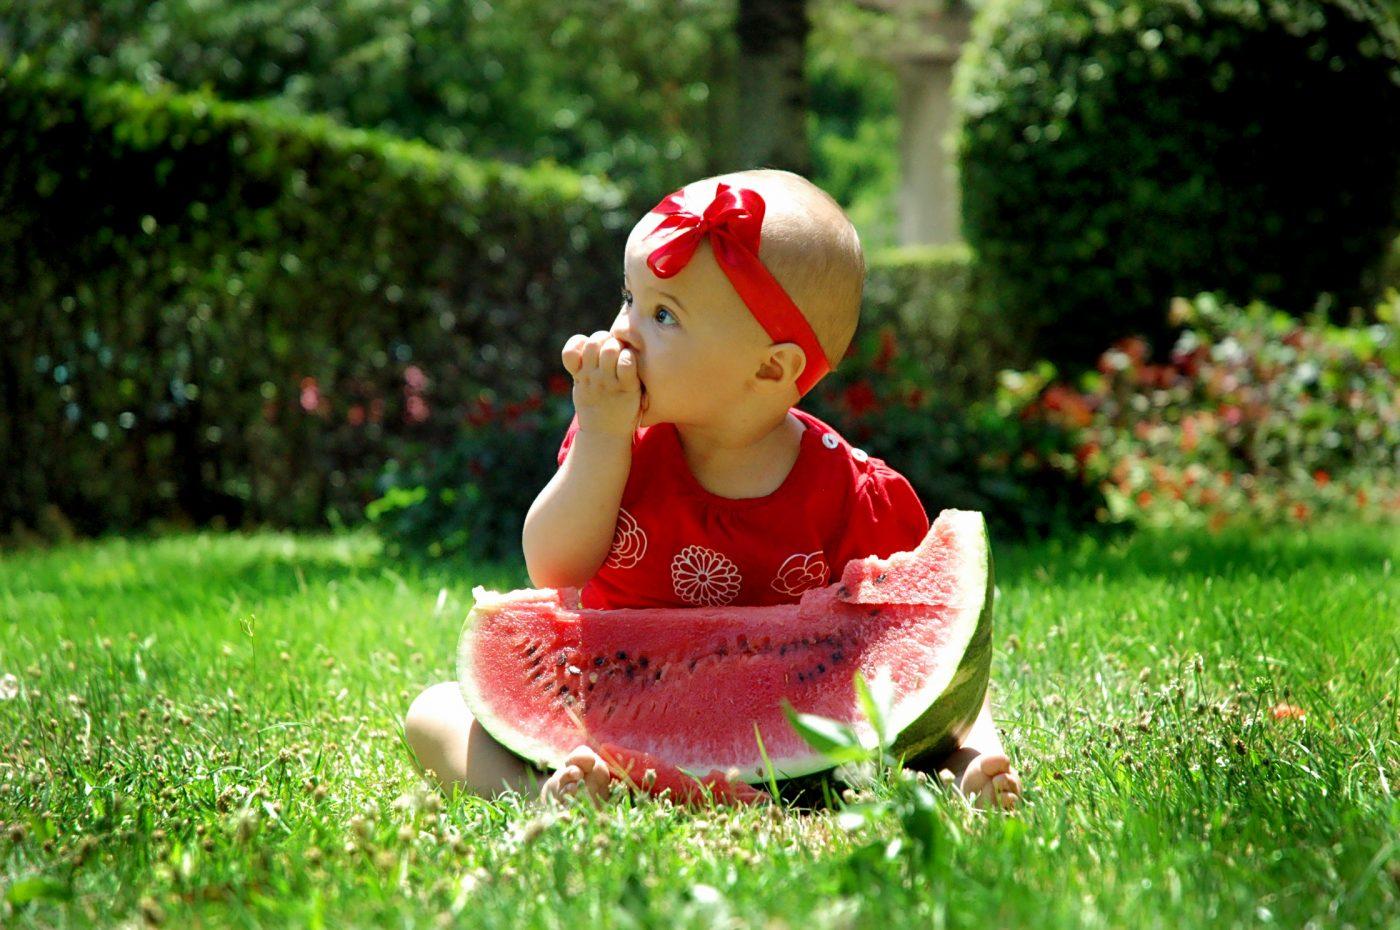 watermelon-my-sweet-baby-1321799-freeimgaes-by-simona-balint